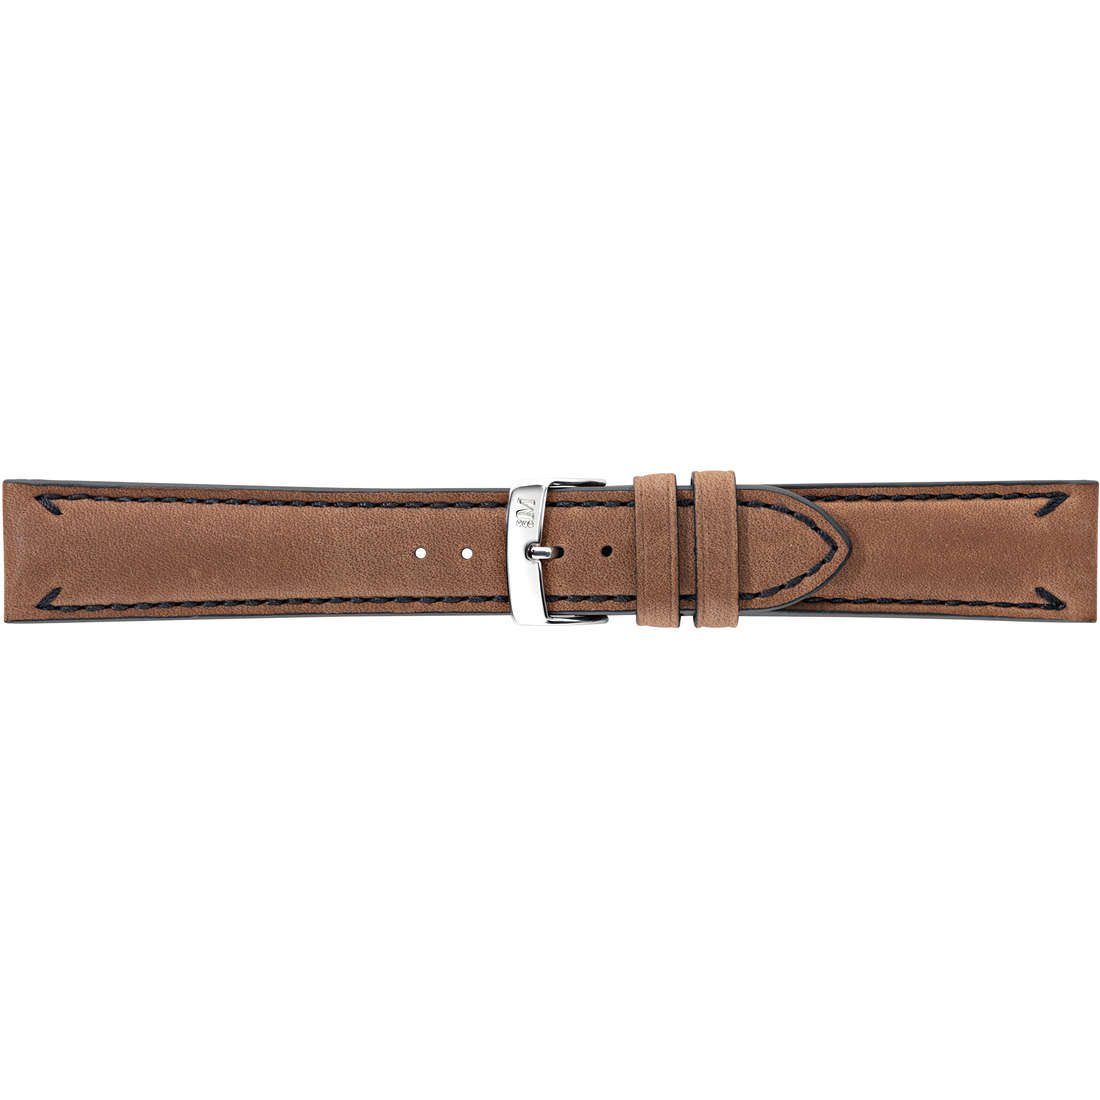 watch watch bands watch straps man Morellato Manufatti A01X4540A61034CR20